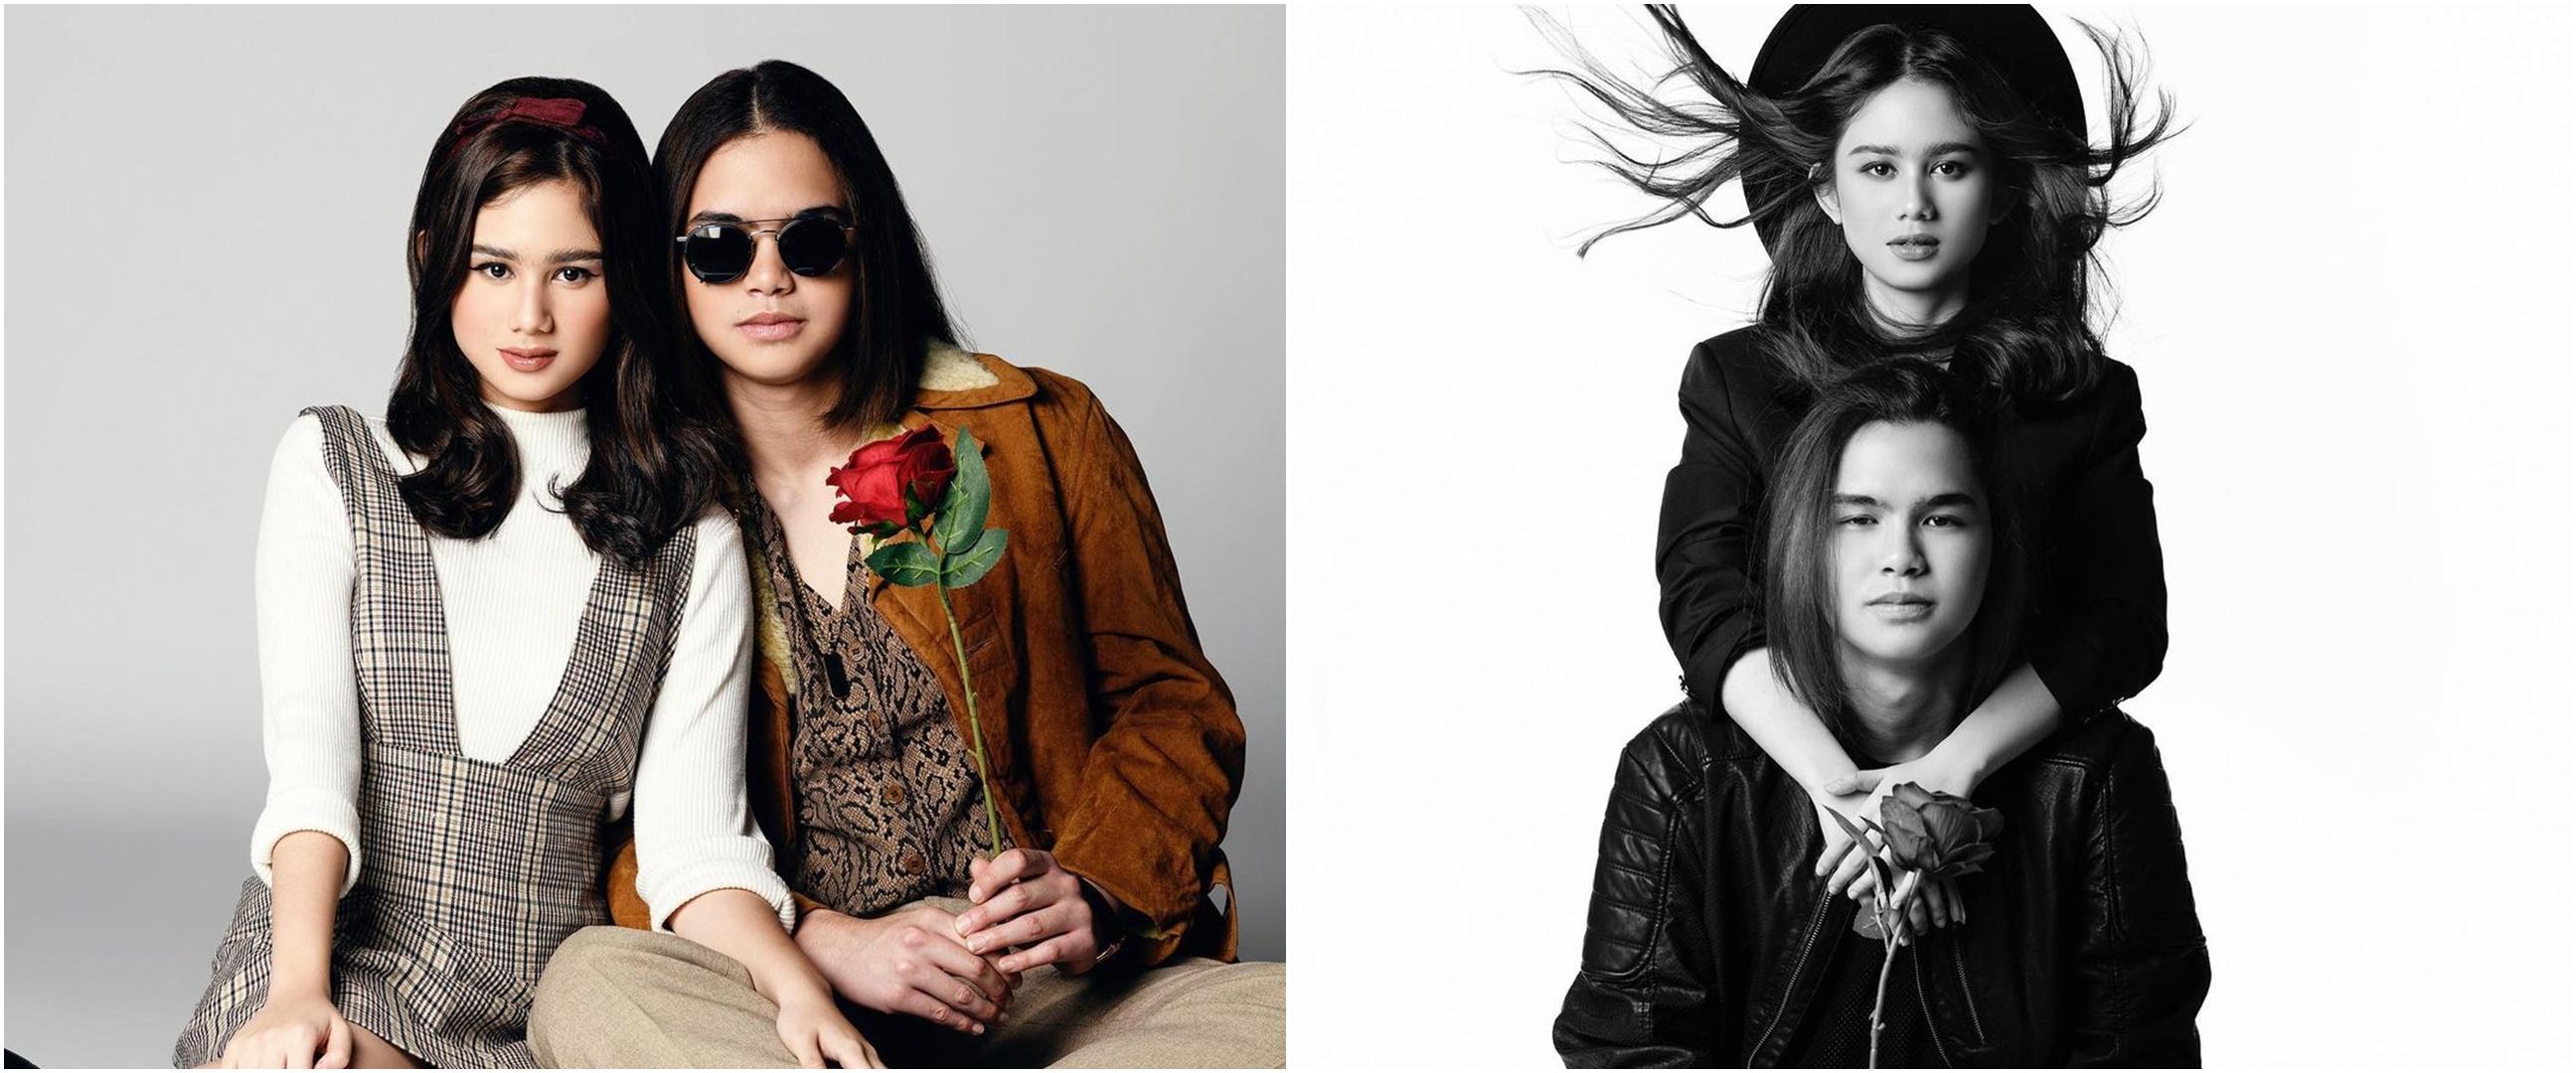 6 Gaya pemotretan Tissa Biani dan Dul, ala Yoko Ono dan John Lennon